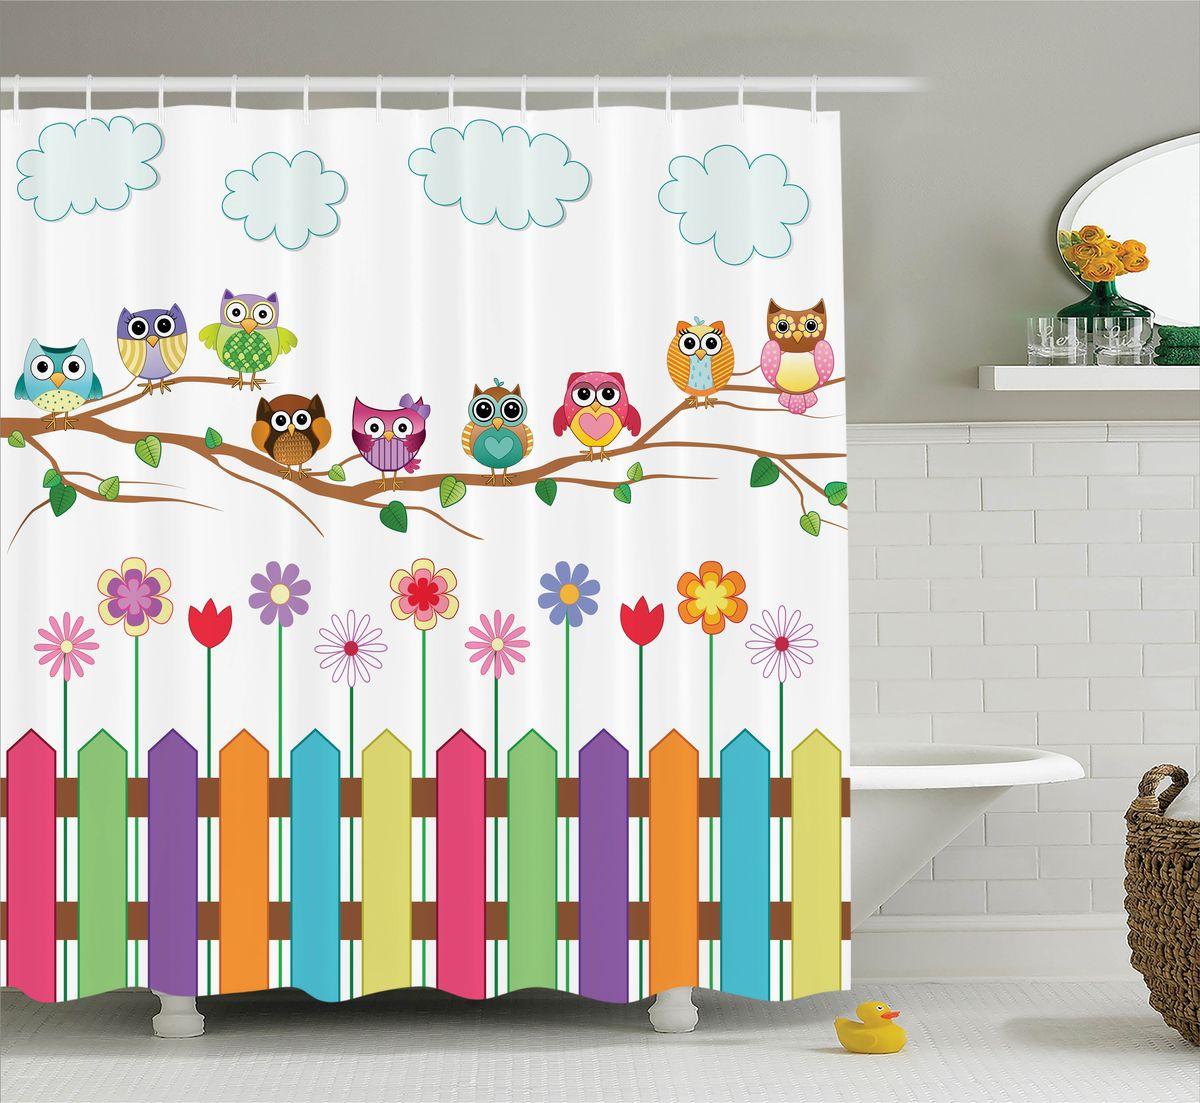 Штора для ванной комнаты Magic Lady Совы  ветке, 180 х 200 см